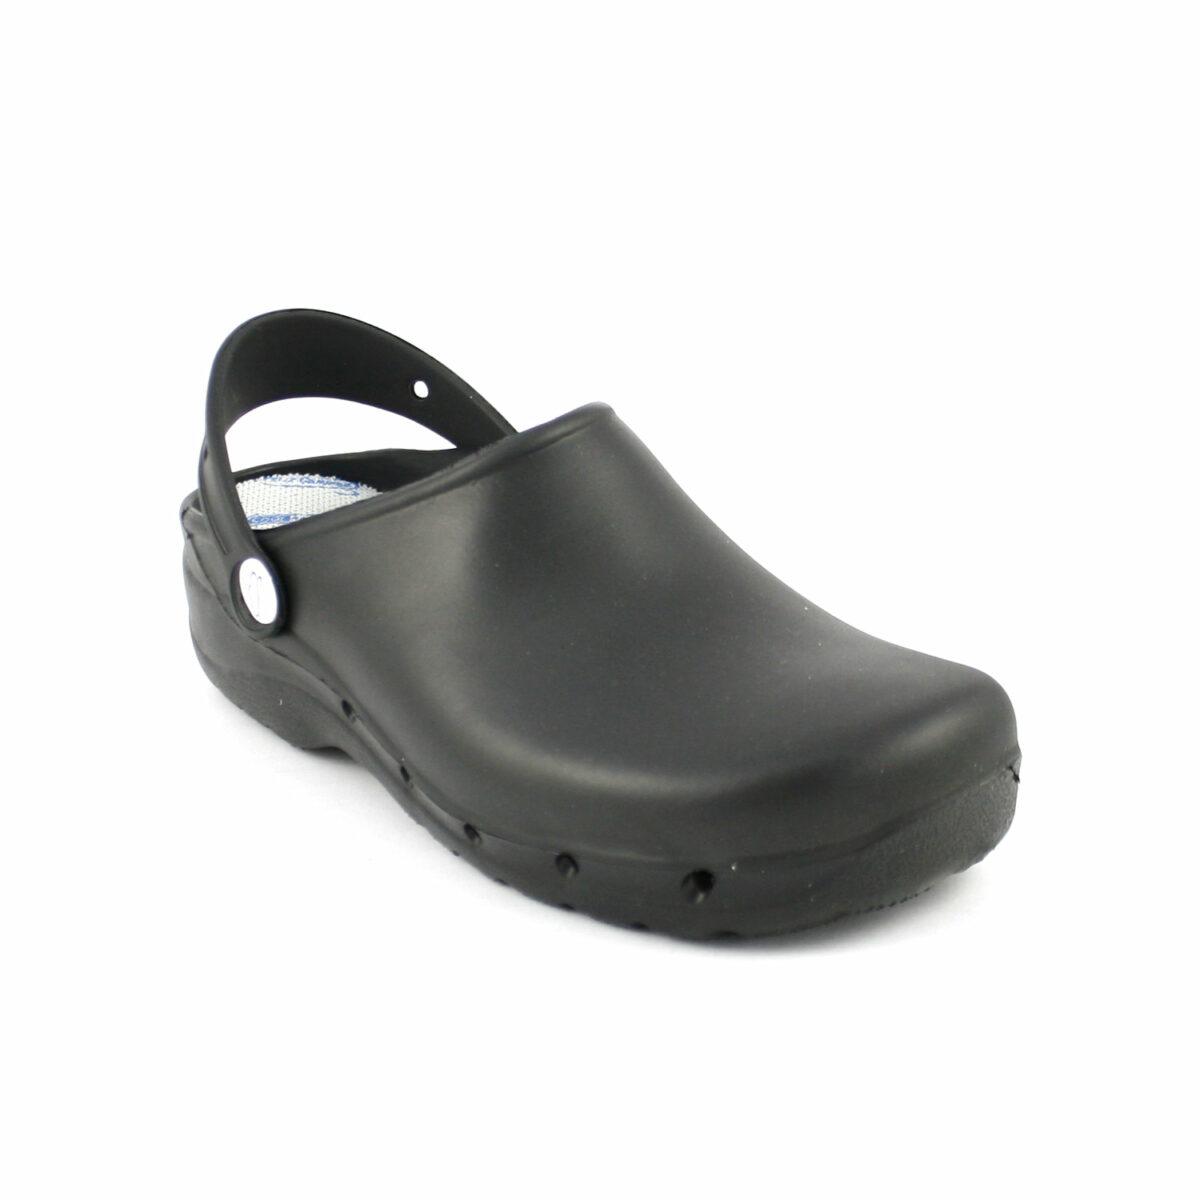 venta caliente online 275a3 25d59 Feliz Caminar - Zueco de trabajo de goma » Calzados Dorado